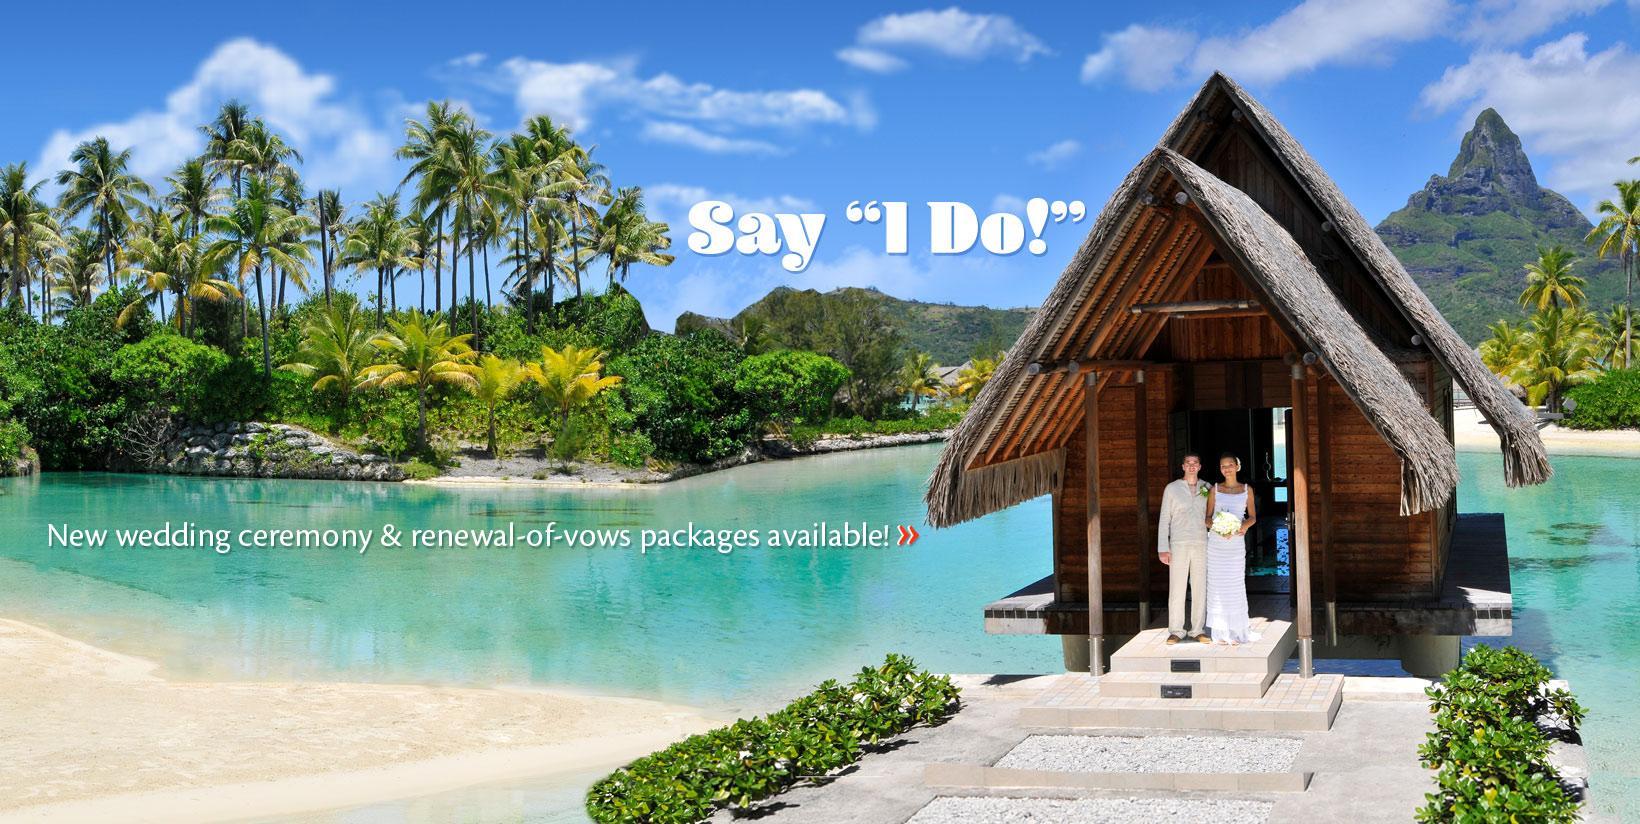 Paul Gauguin Luxury Cruises - Two Week Sale on select 2017/18 Sailings - Book by August 19, 2017